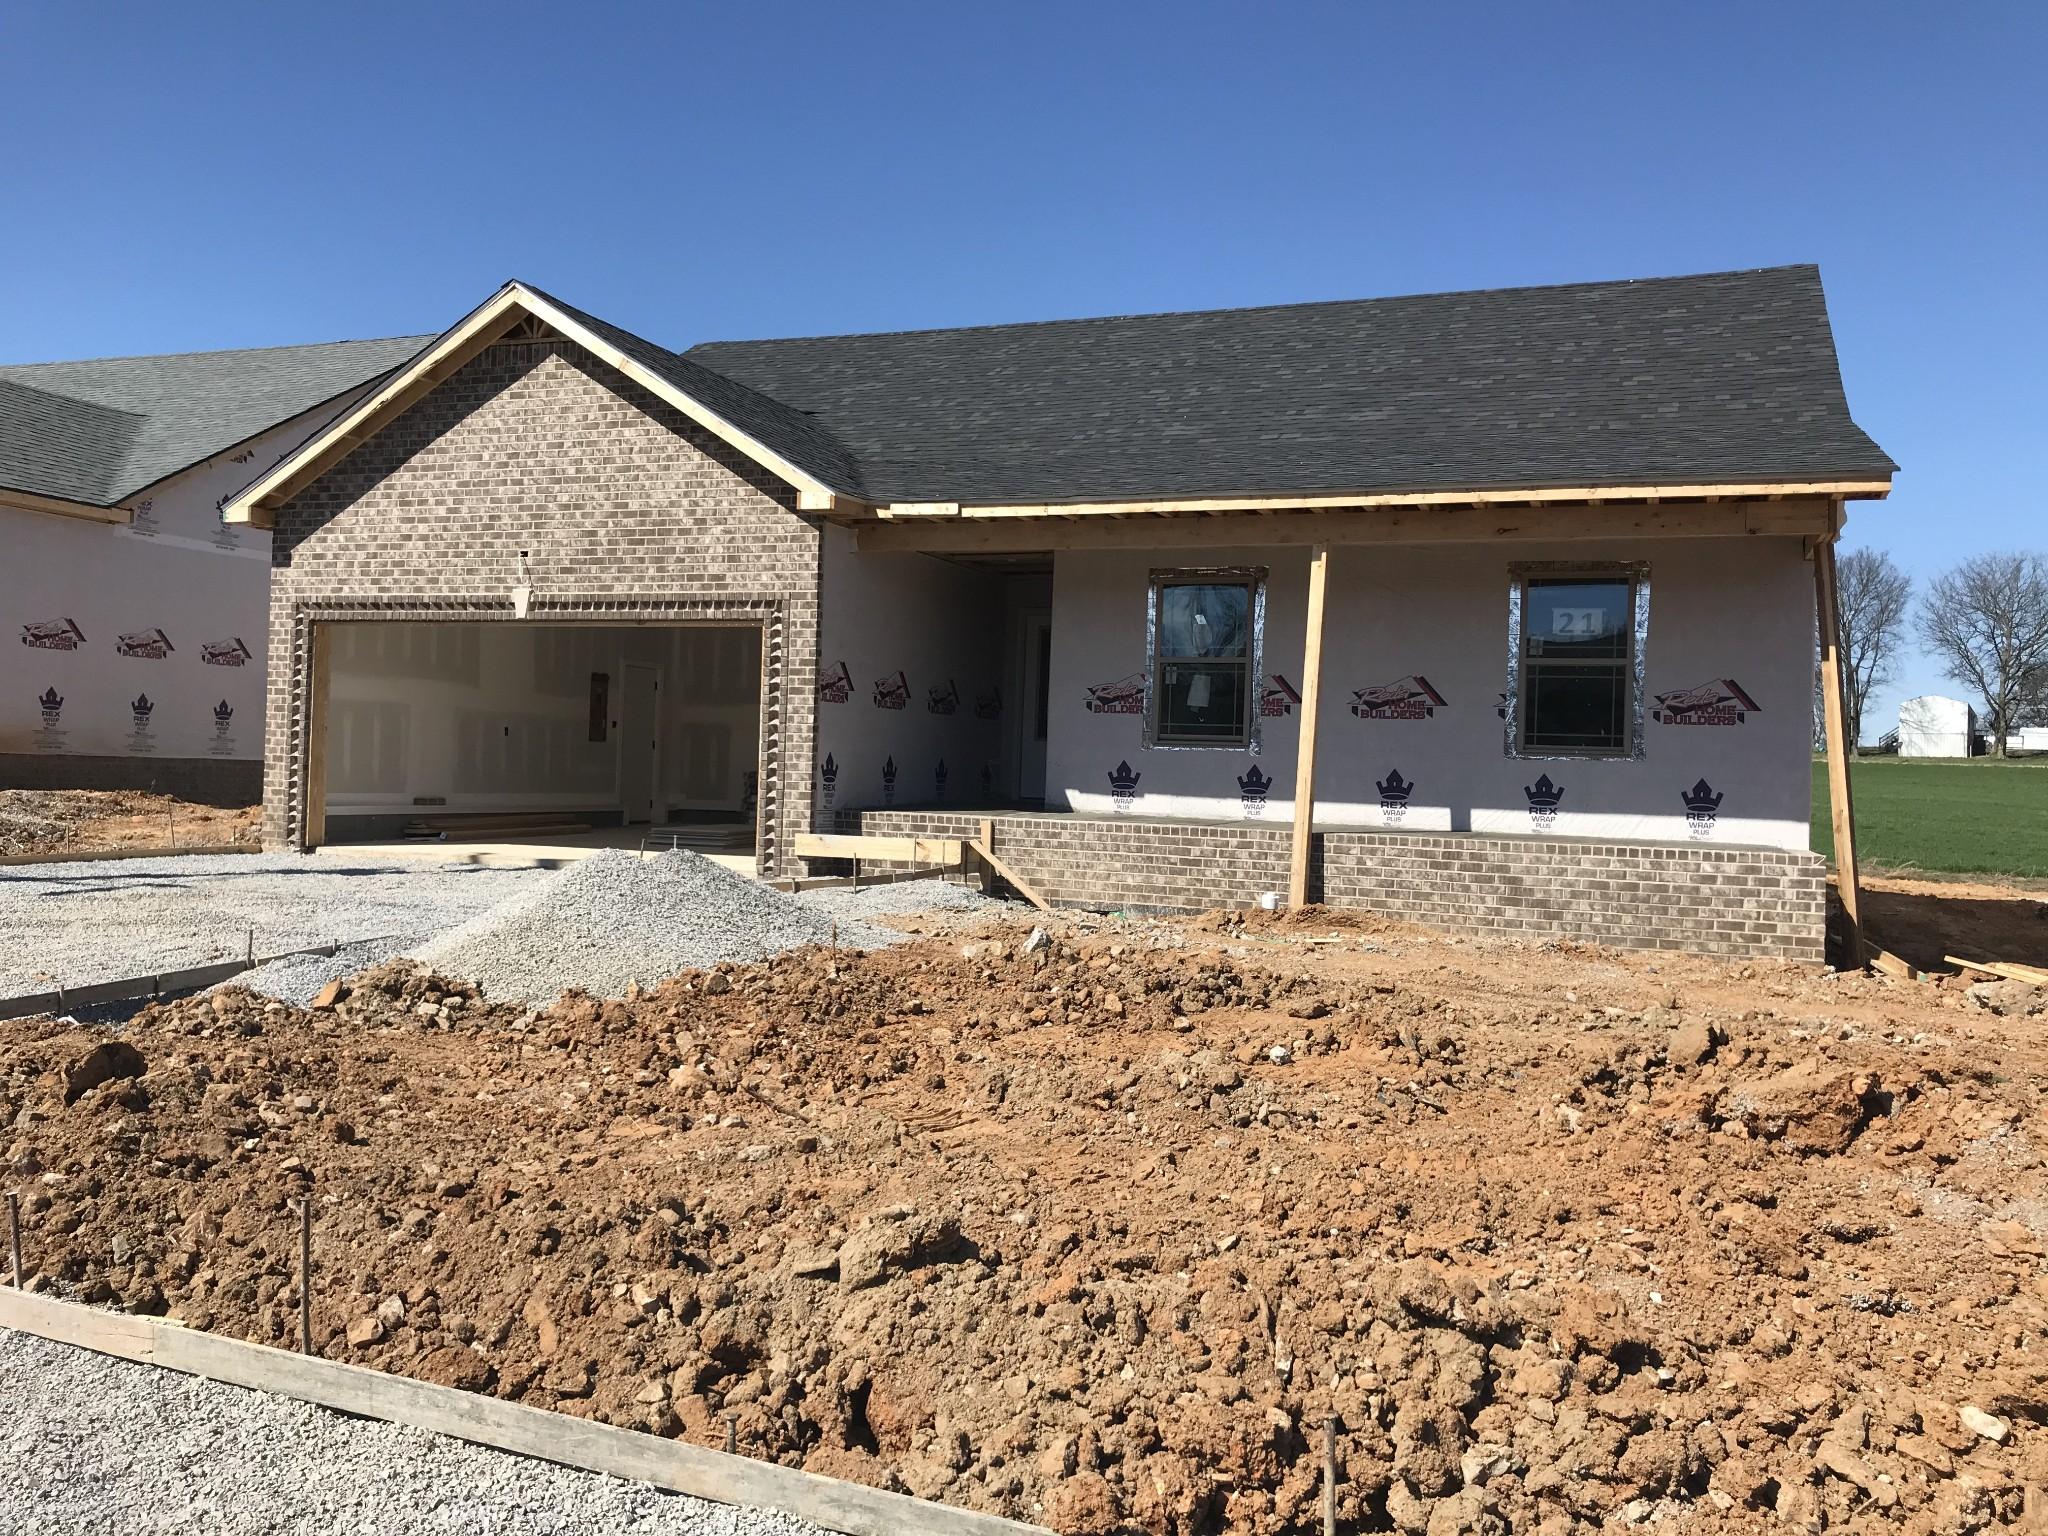 21 ROSE EDD ESTATES, Oak Grove, KY 42262 - Oak Grove, KY real estate listing